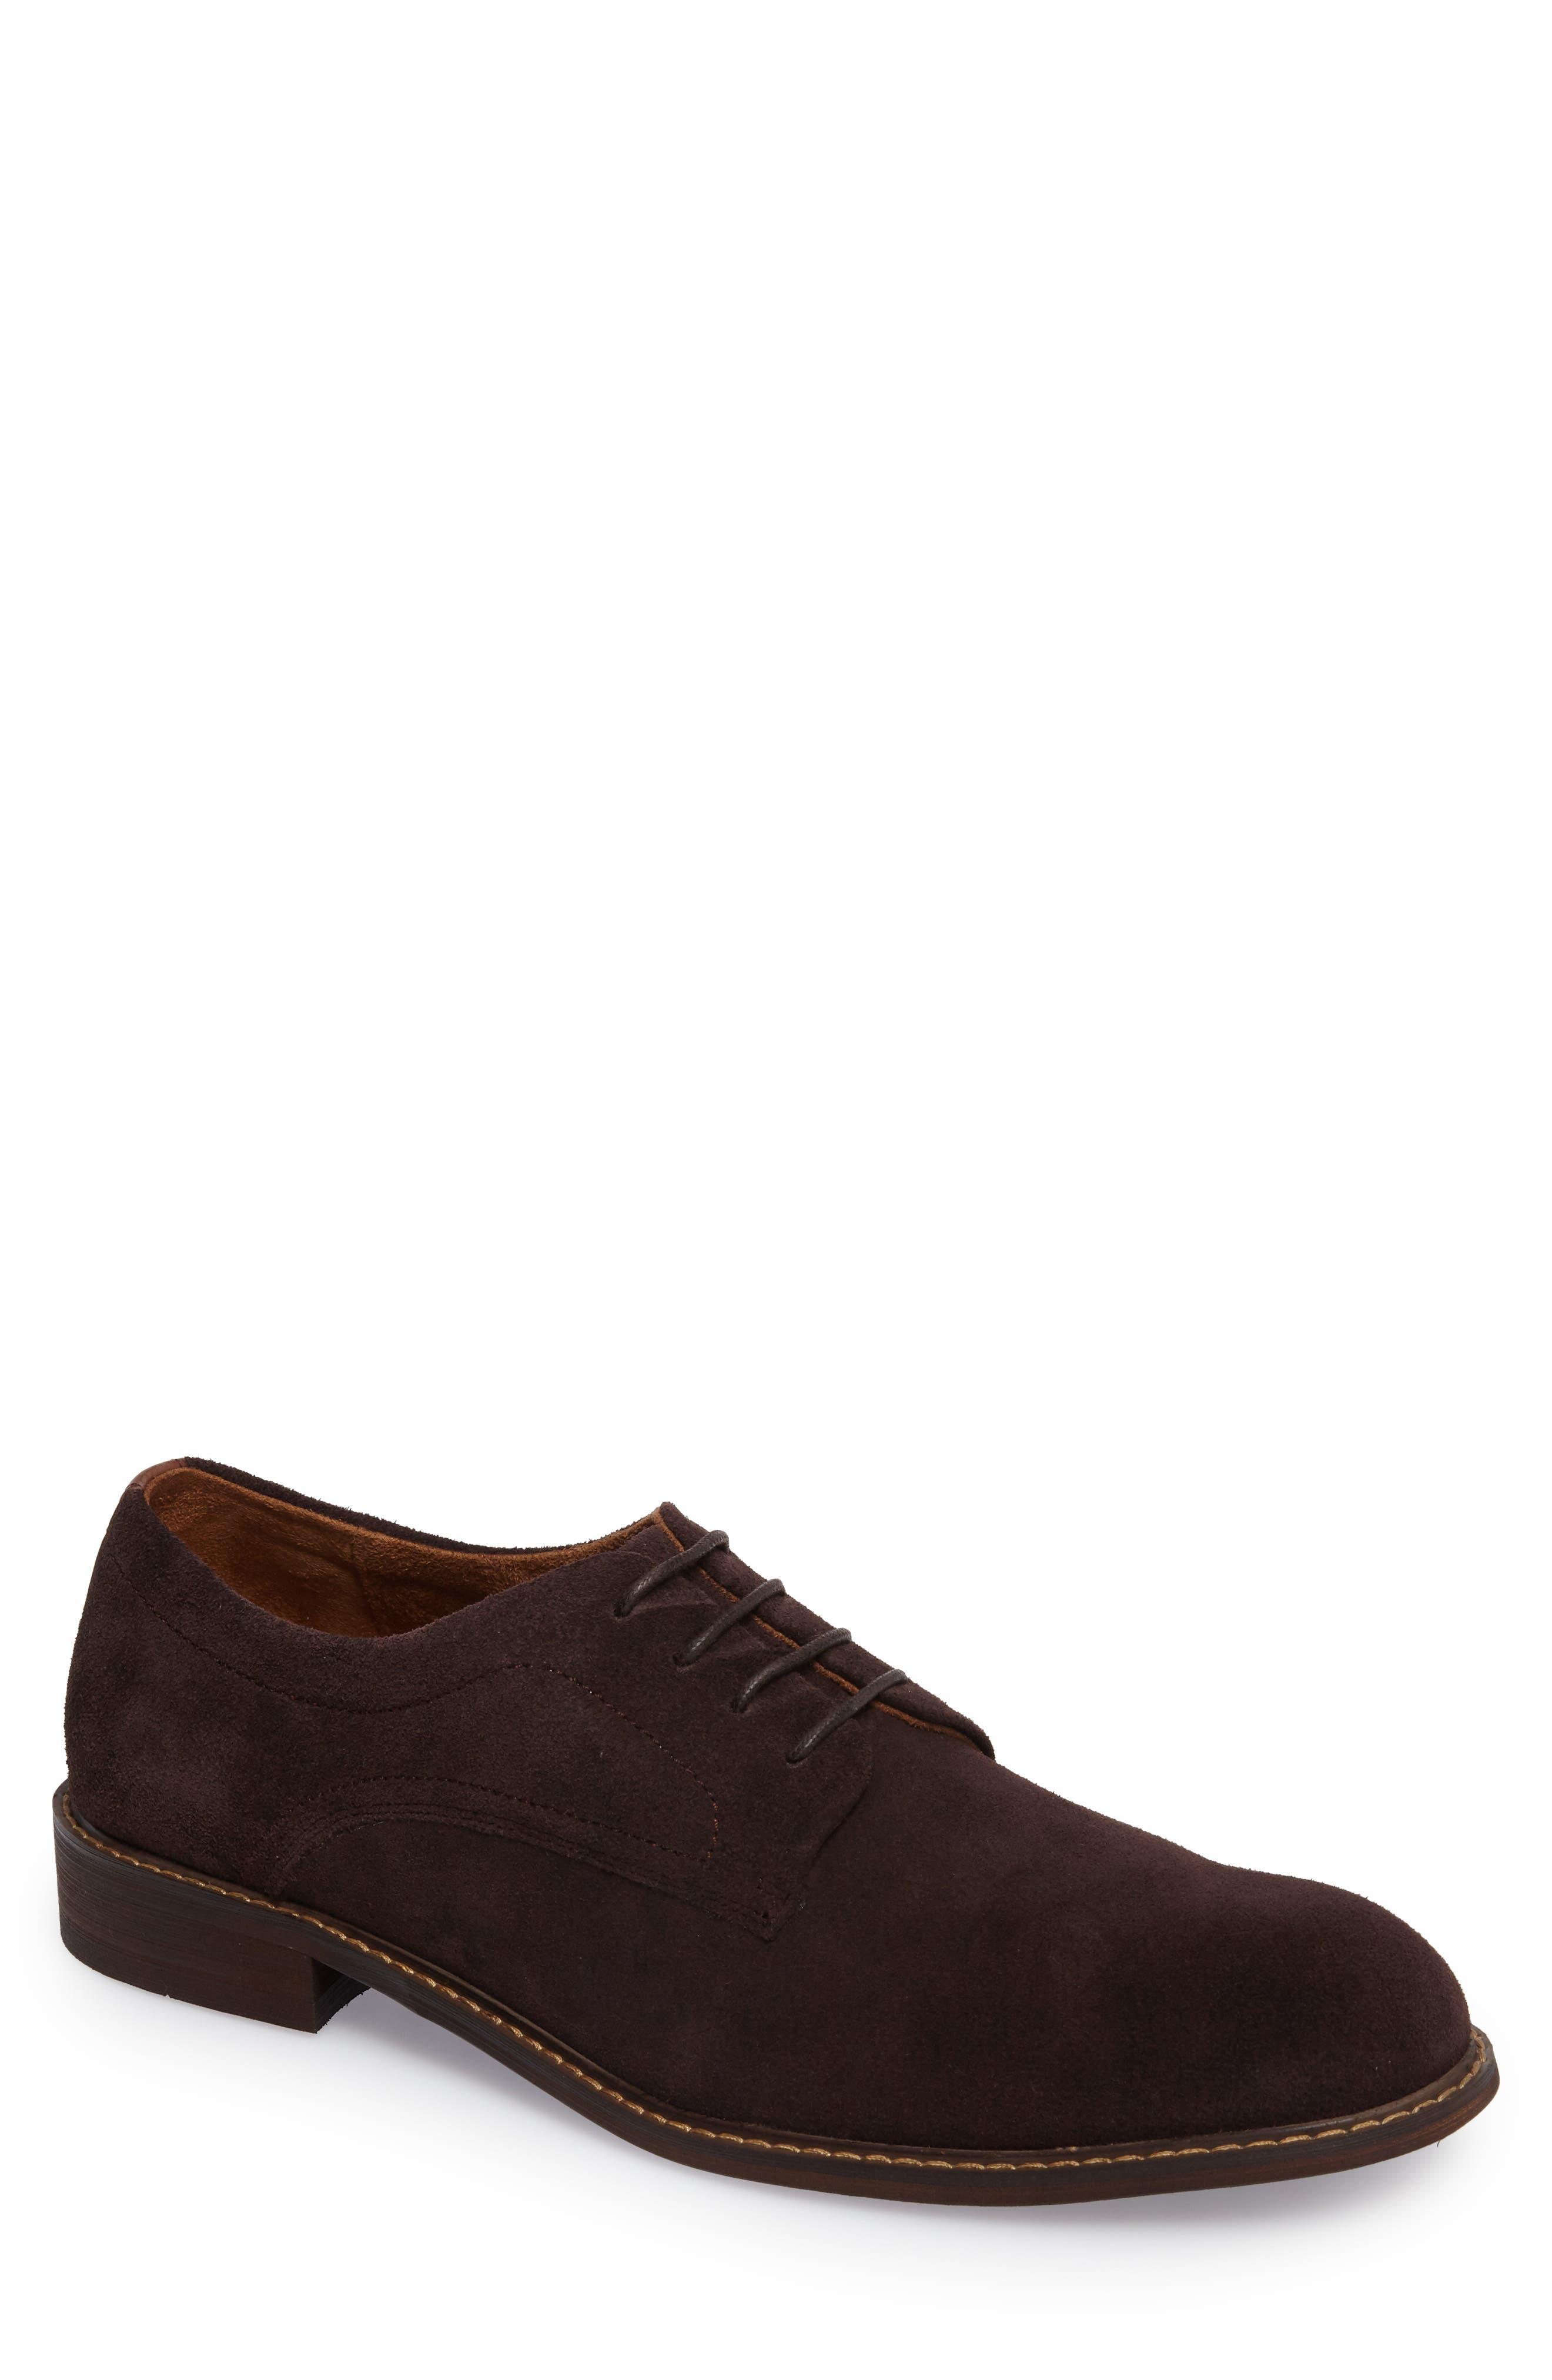 Buck Shoe,                         Main,                         color, Chocolate Suede